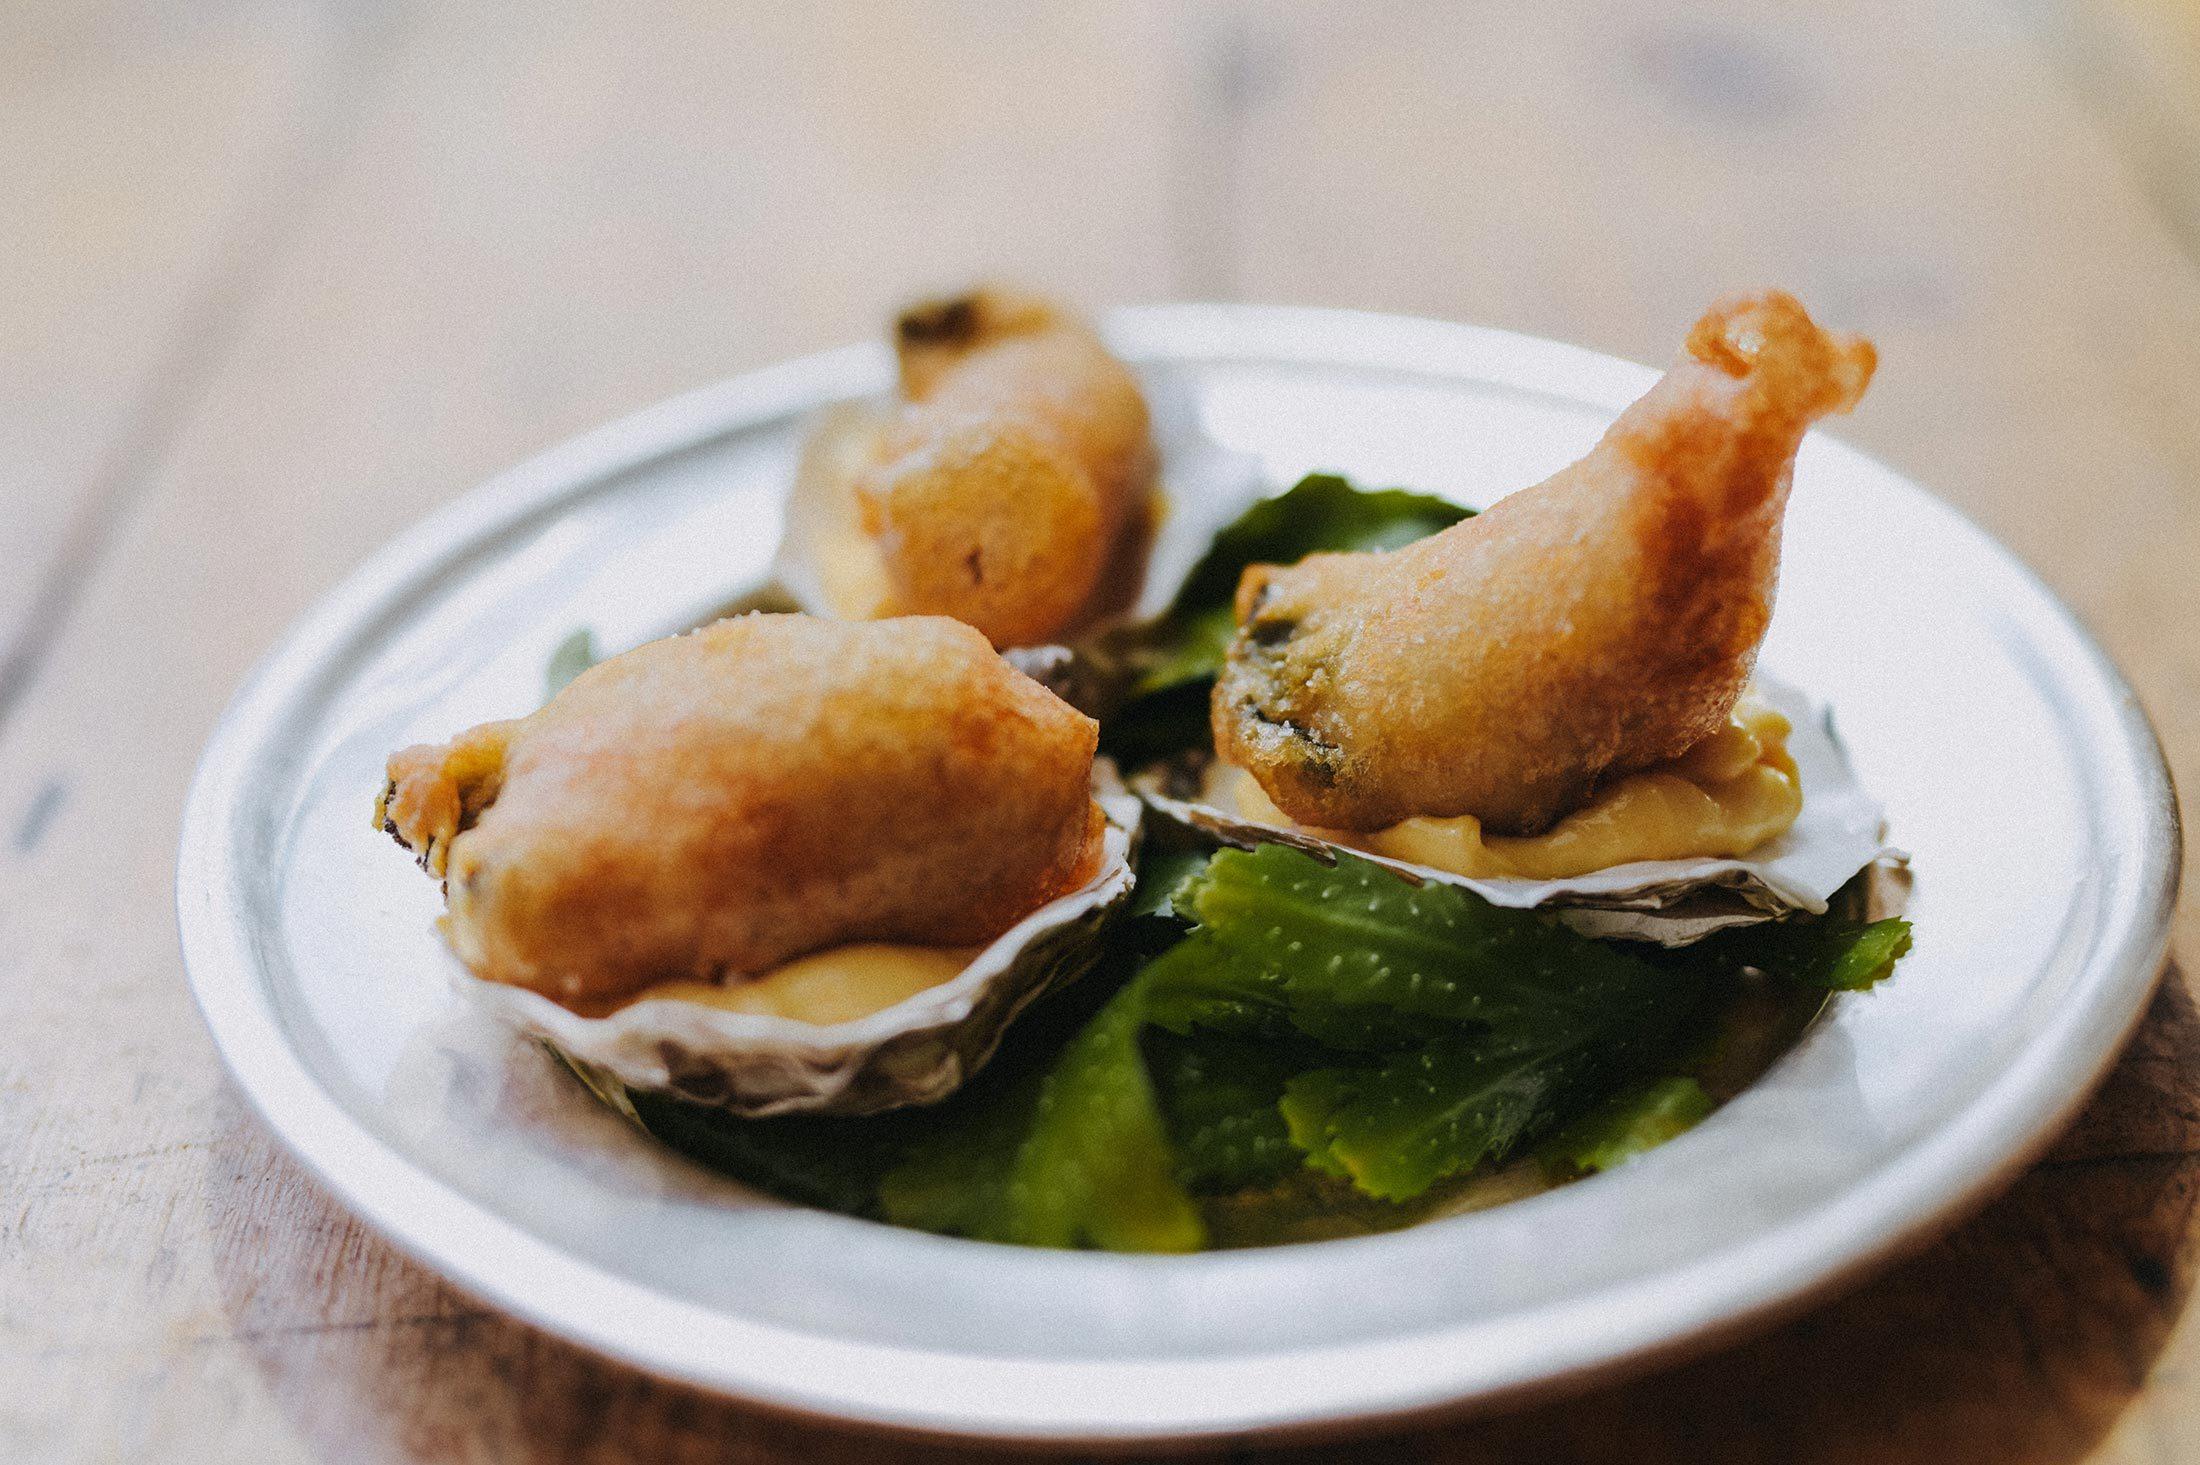 Fried Oysters Mark Hix